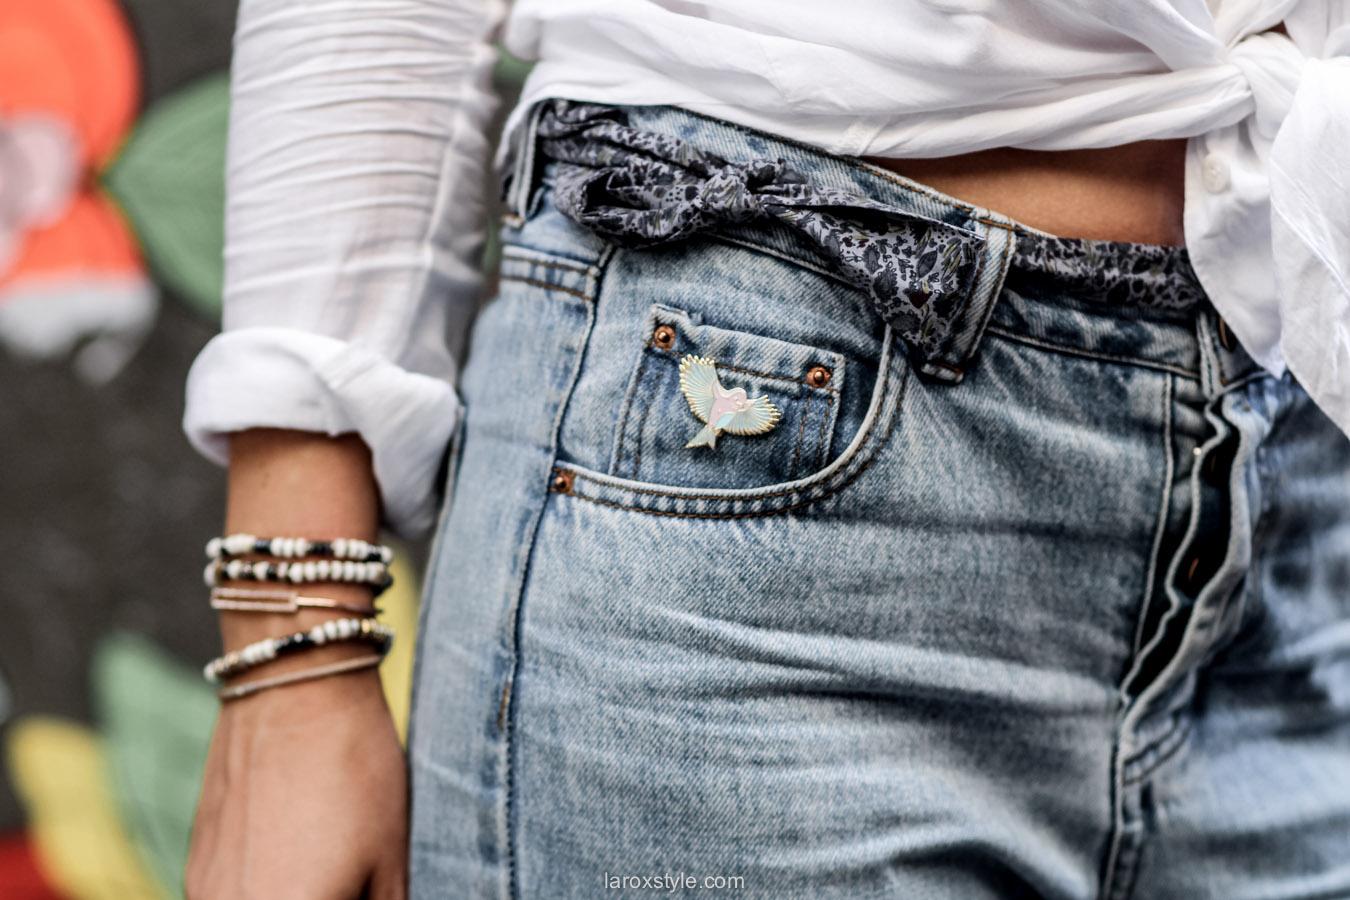 pins les filles a - natacha birds - laroxstyle - blog mode lyon